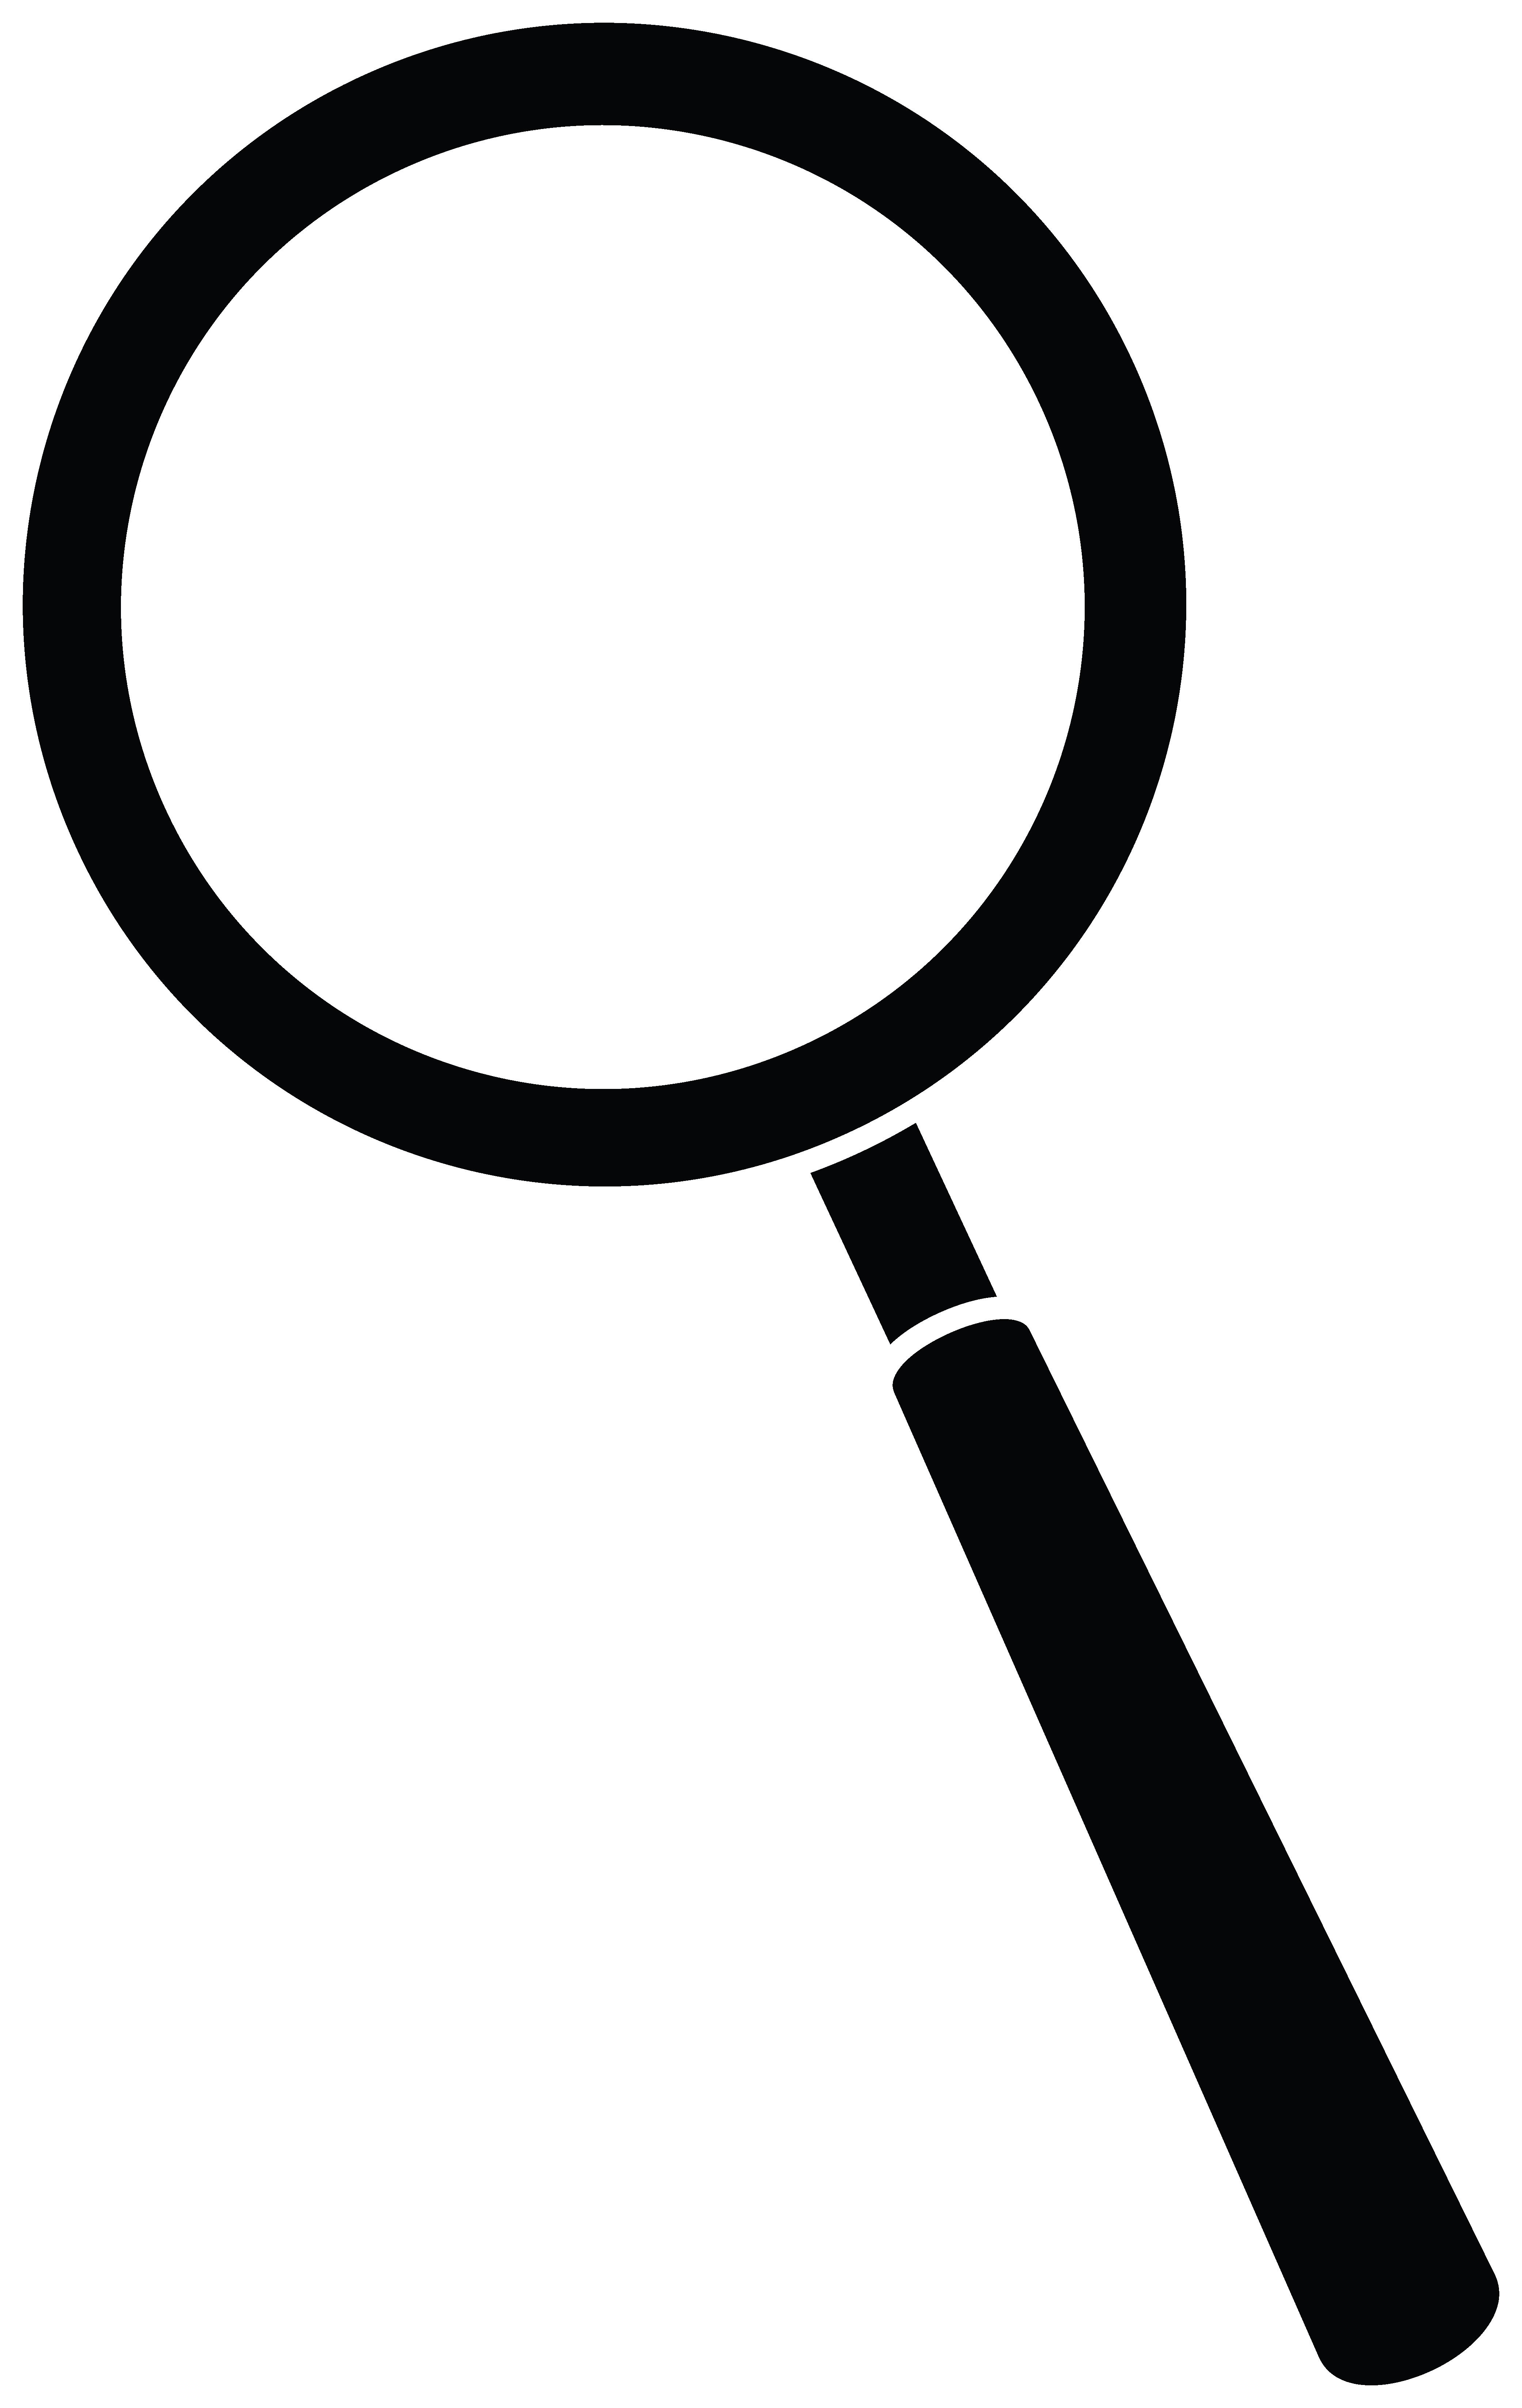 Free clipart book detective image transparent download Detective Silhouette Clip Art at GetDrawings.com | Free for personal ... image transparent download